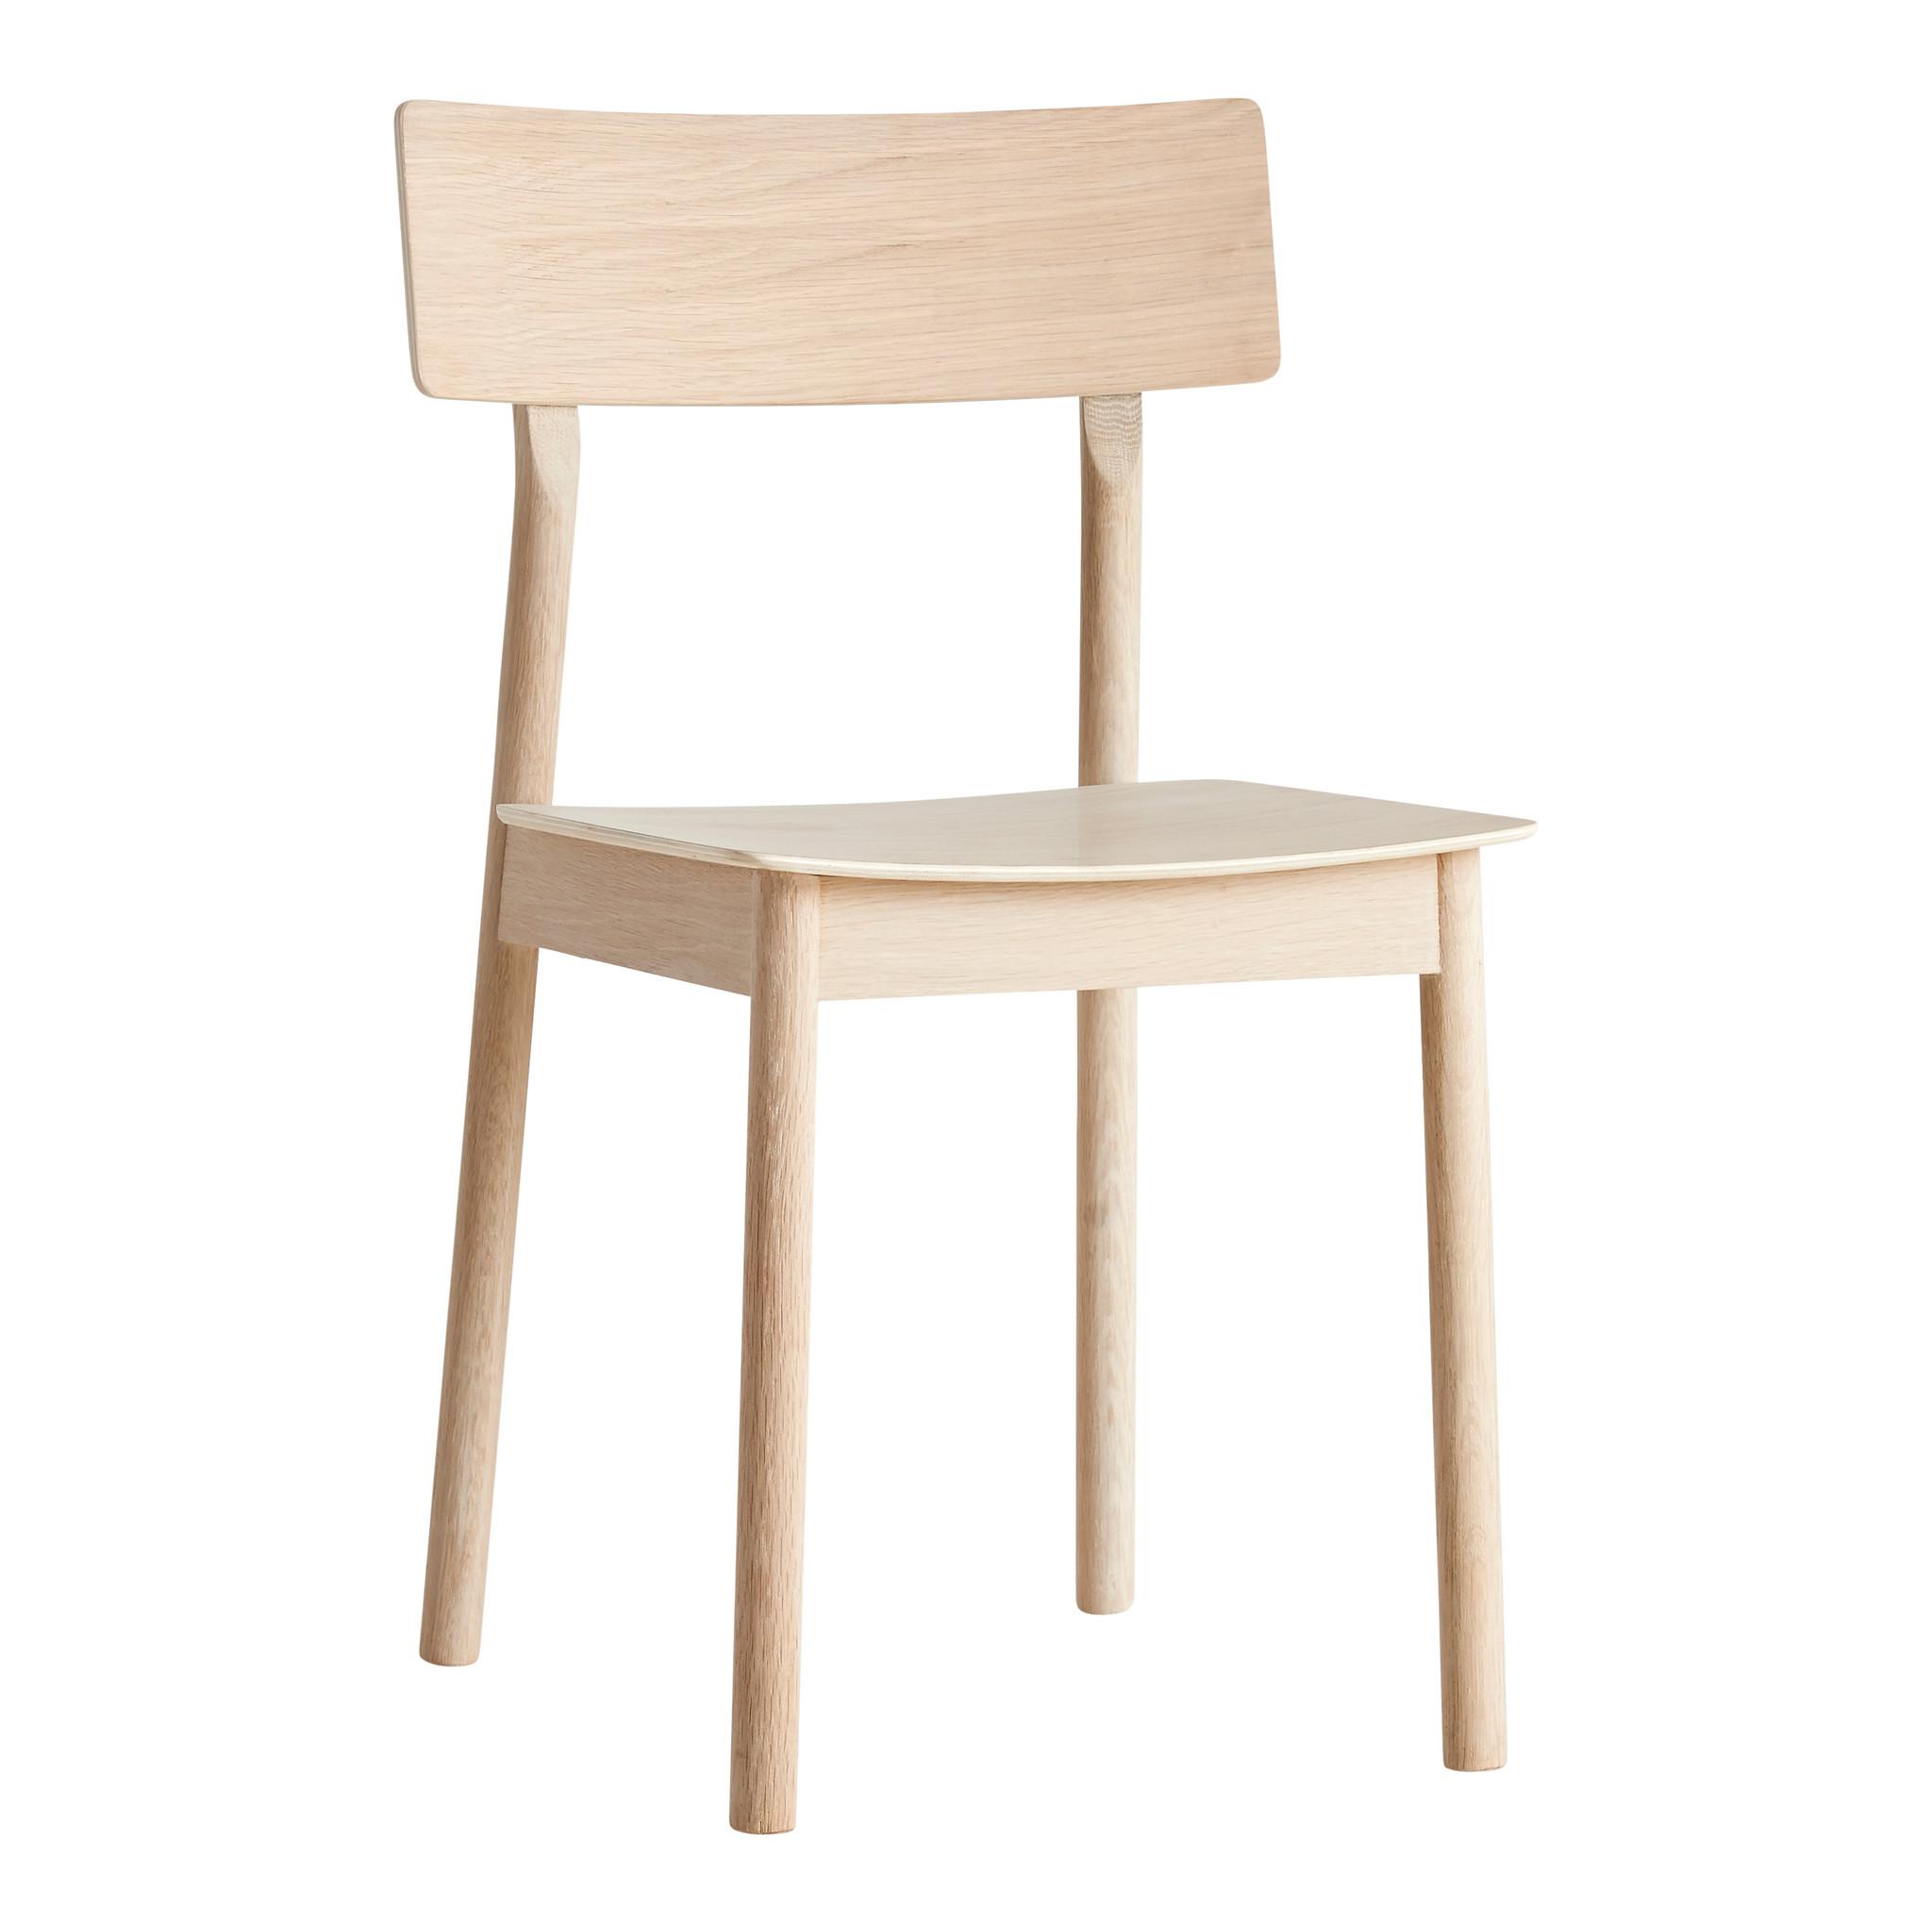 Woud Pause spisebordsstol / egetræ